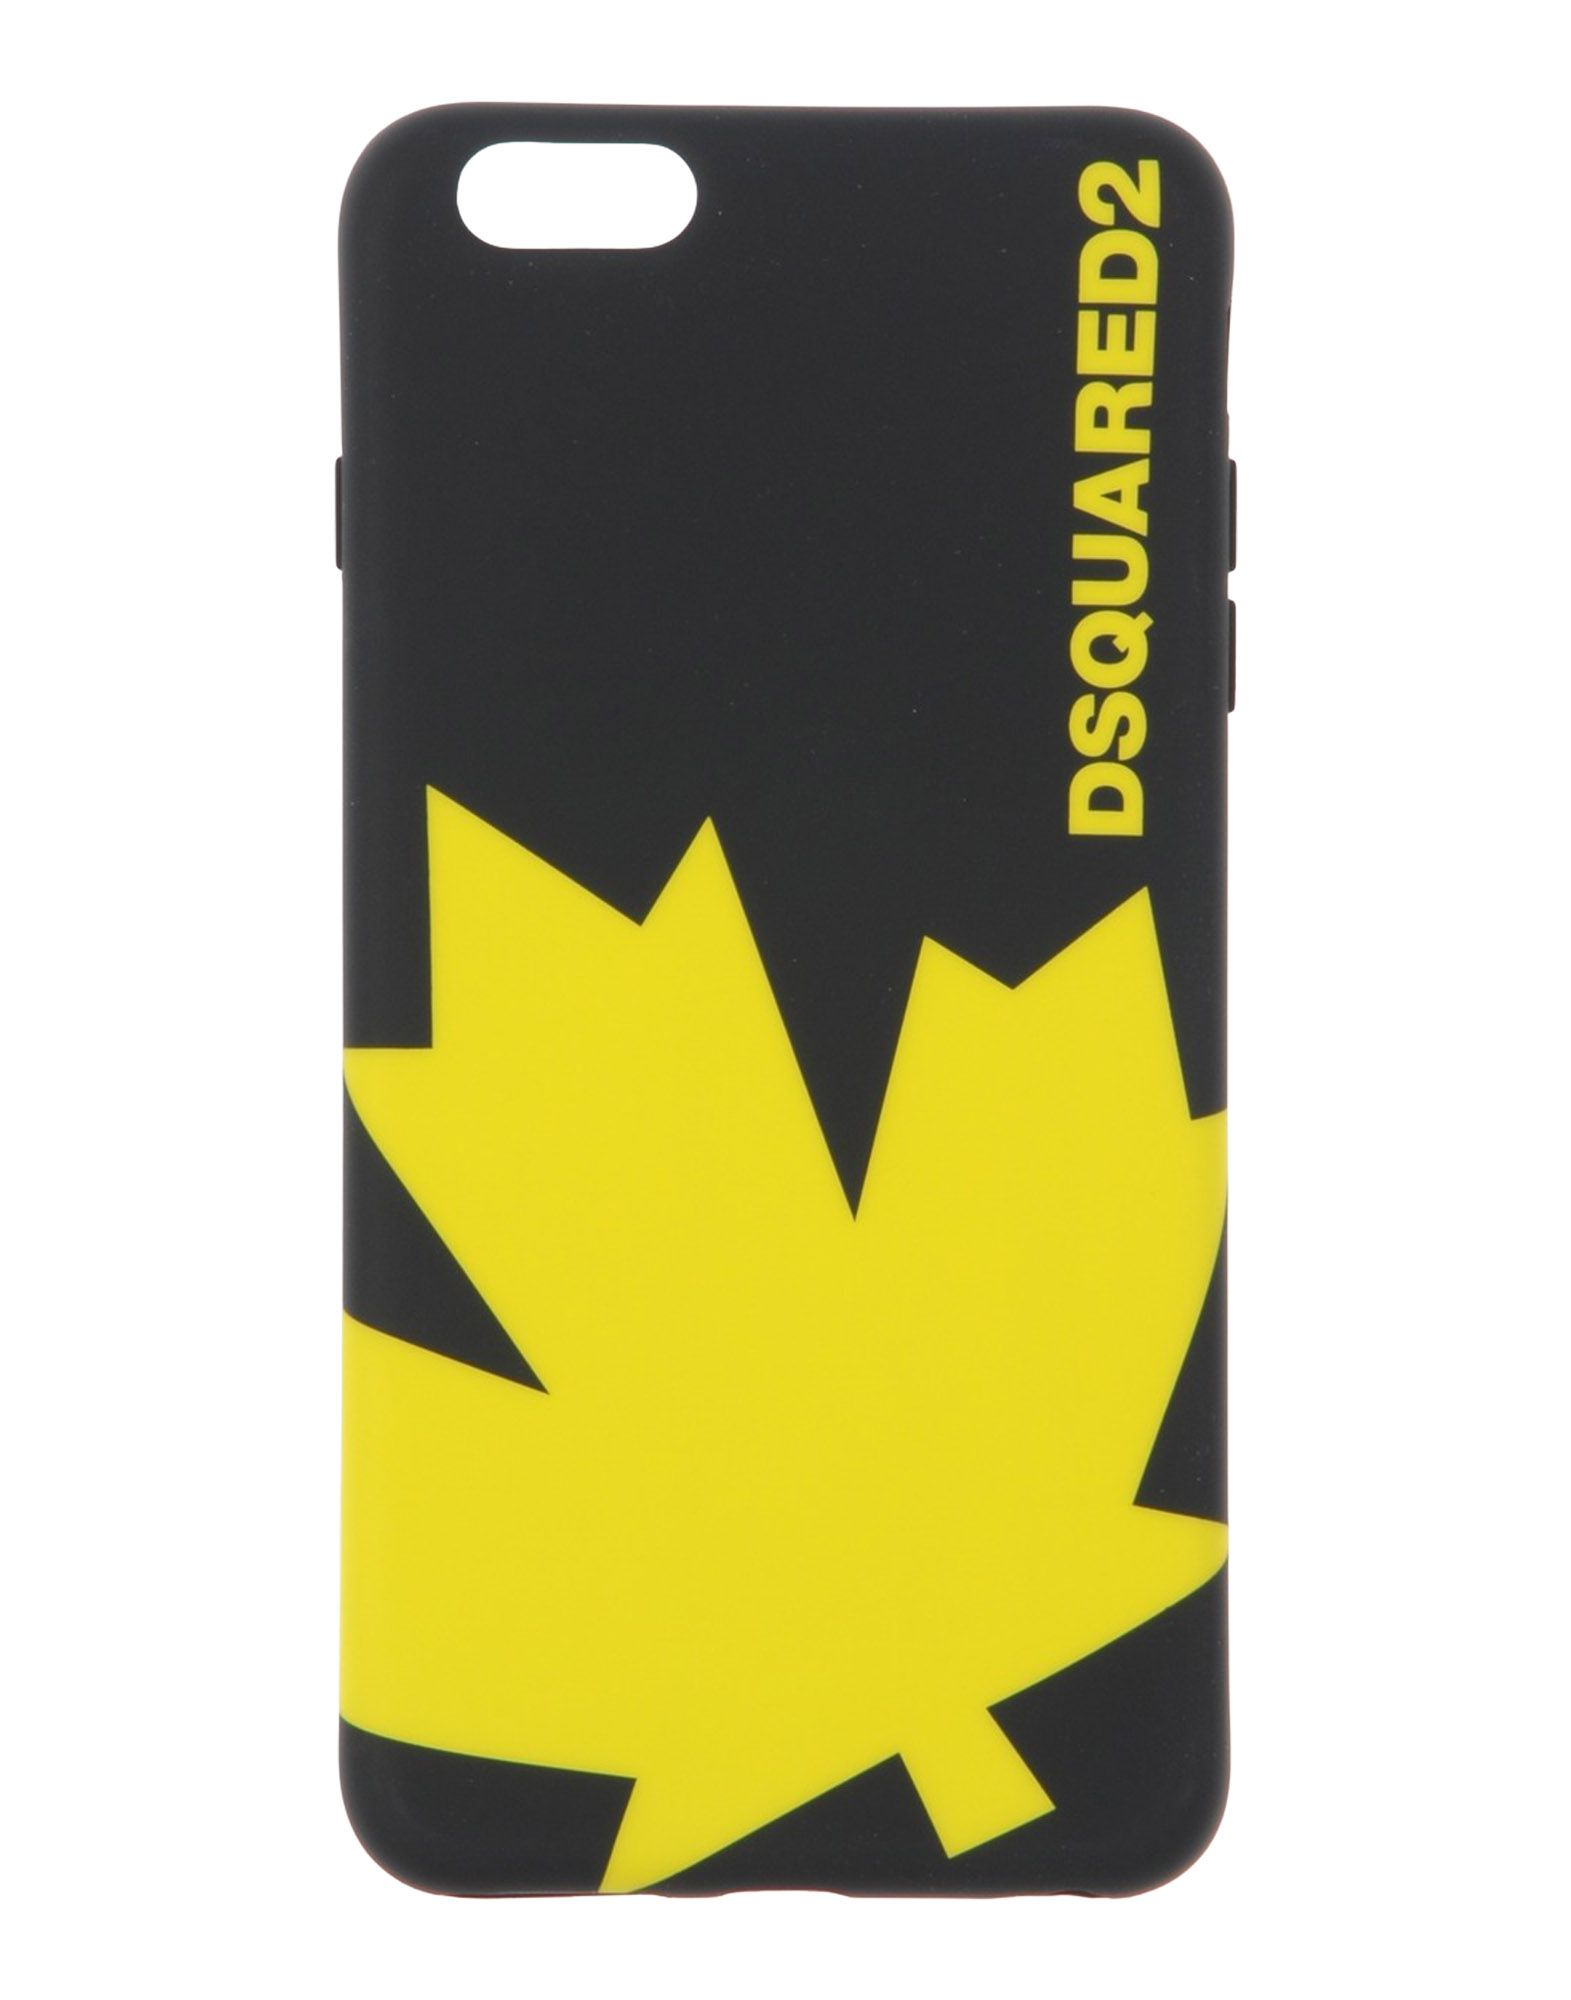 DSQUARED2 Чехол чехол накладка для iphone 5 5s 6 6s 6plus 6s plus змеиный дизайн